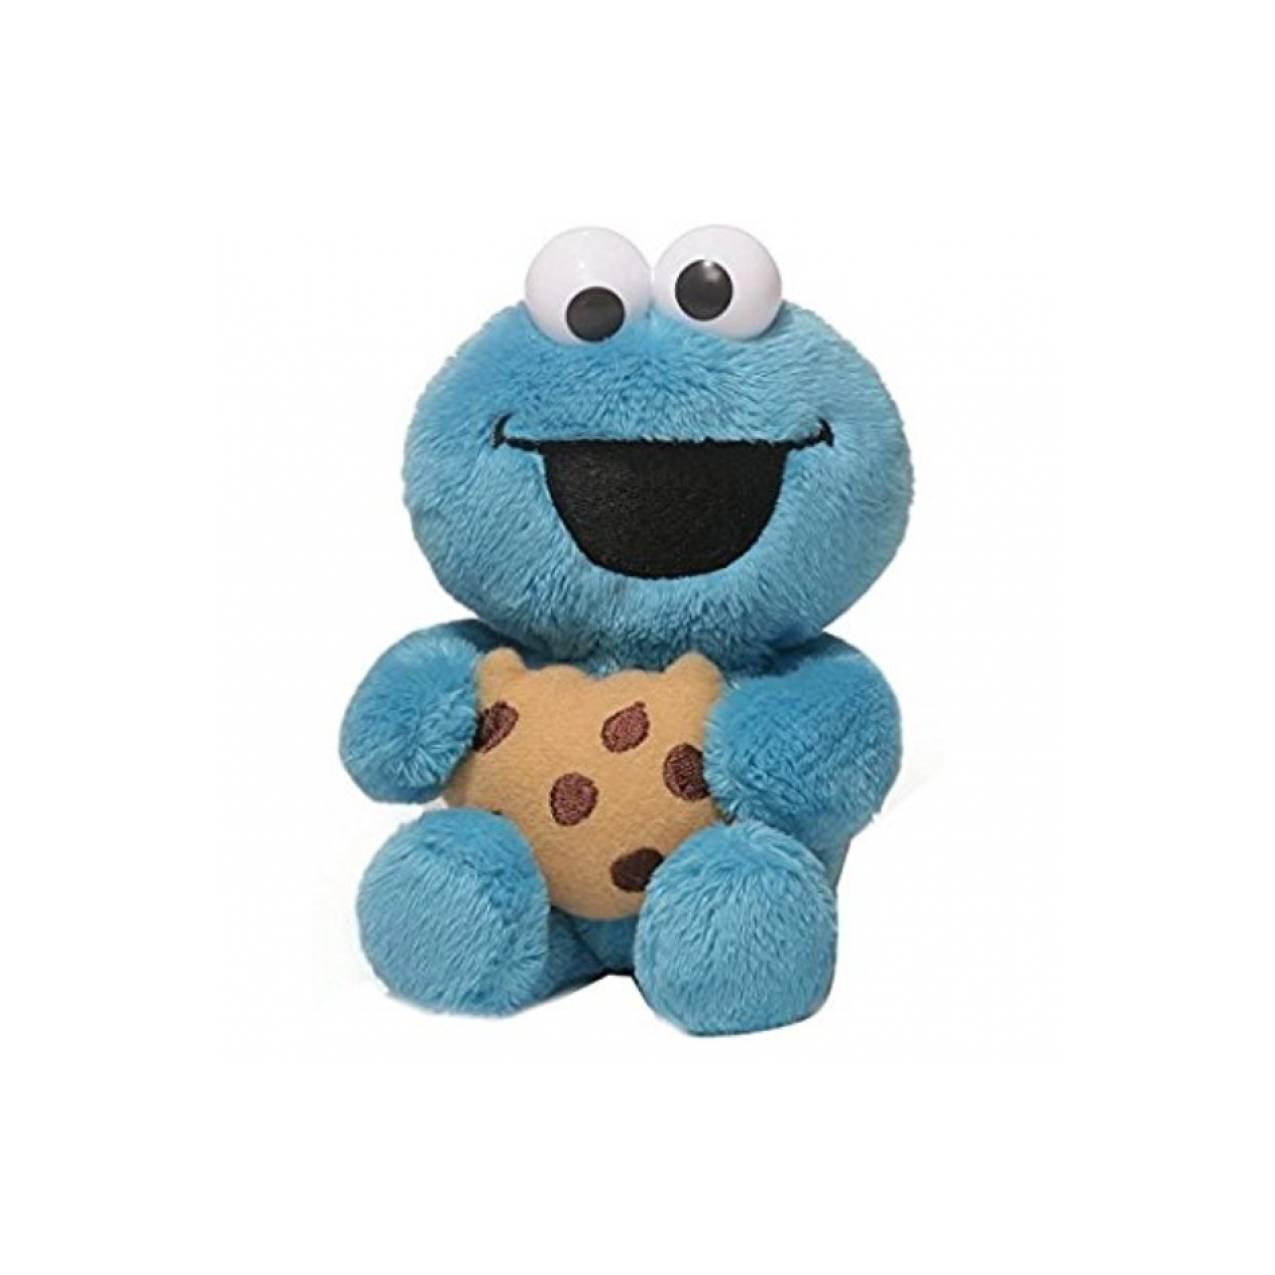 Boneka Sesame Street S Elmo Ss007 1 - Daftar Harga Terlengkap Indonesia 447b622e30